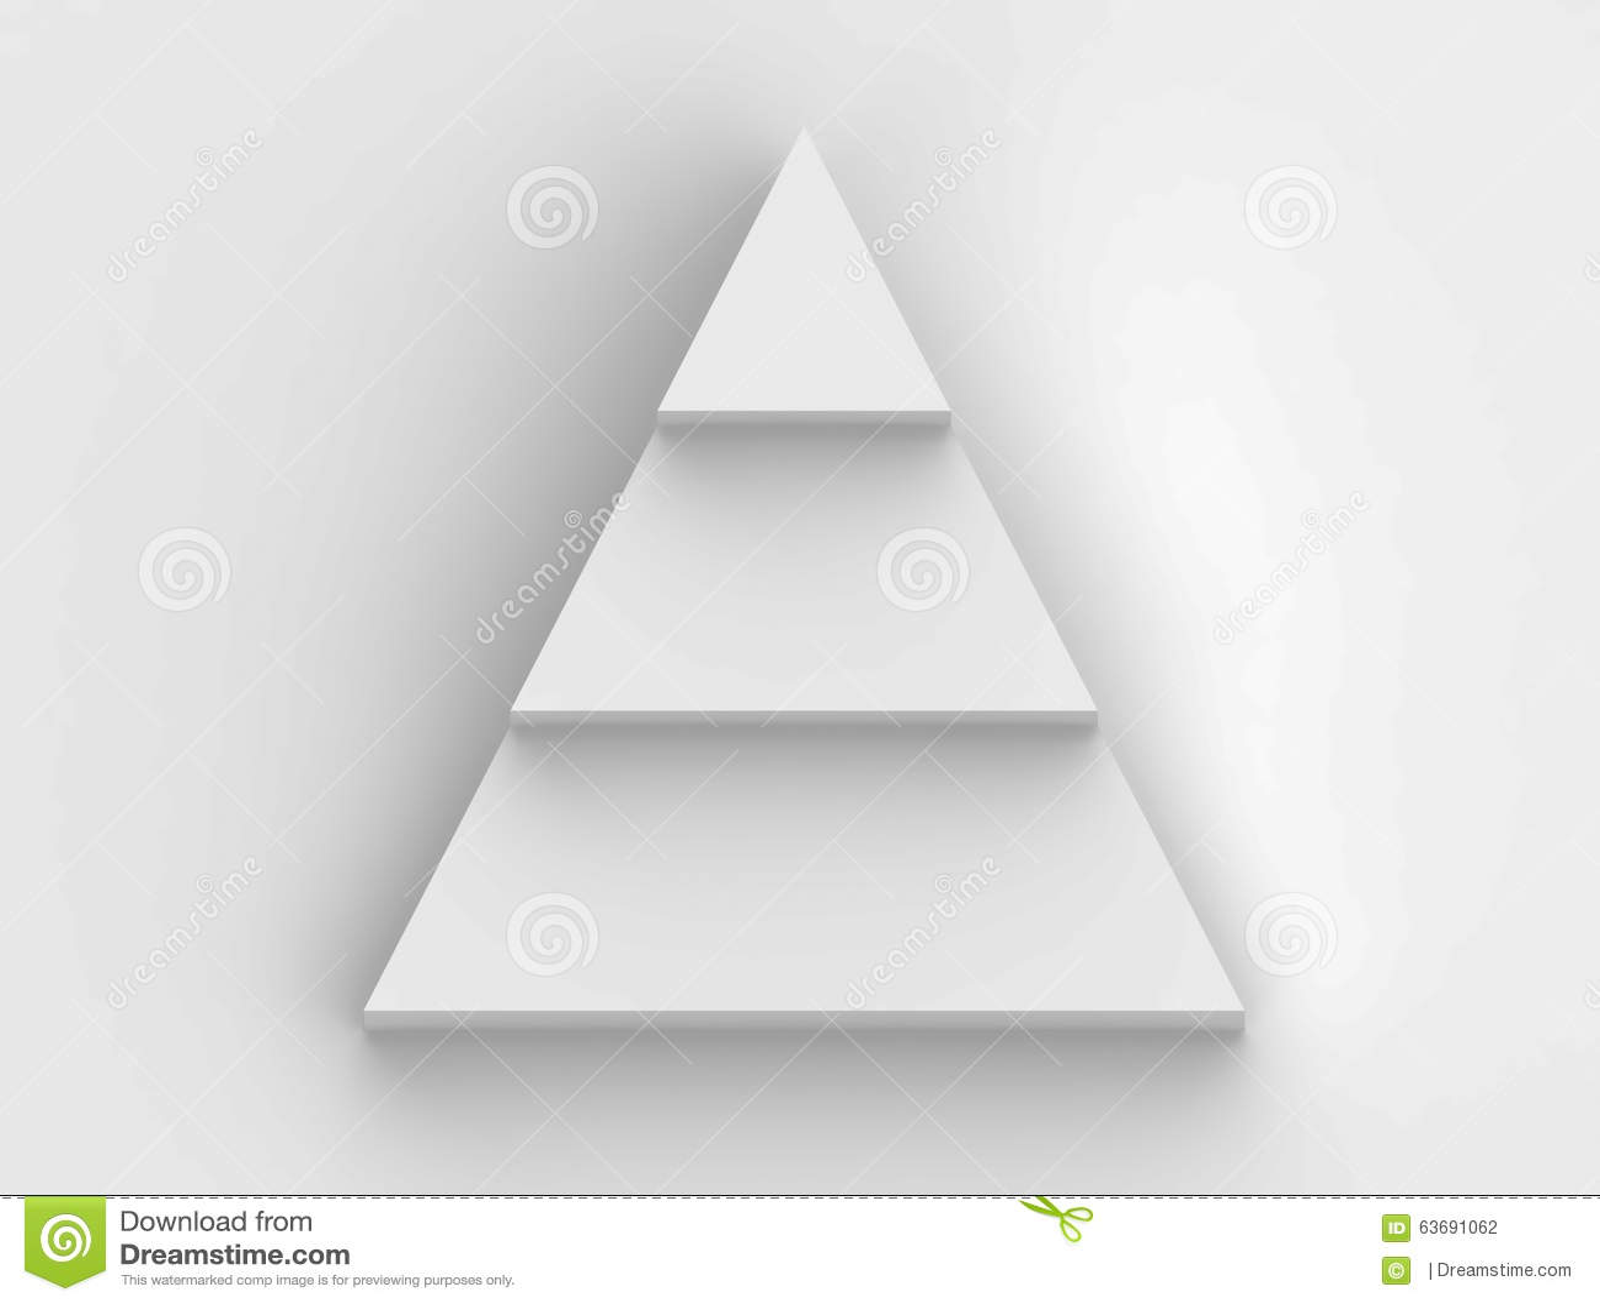 Pyramid step flowchart in white background